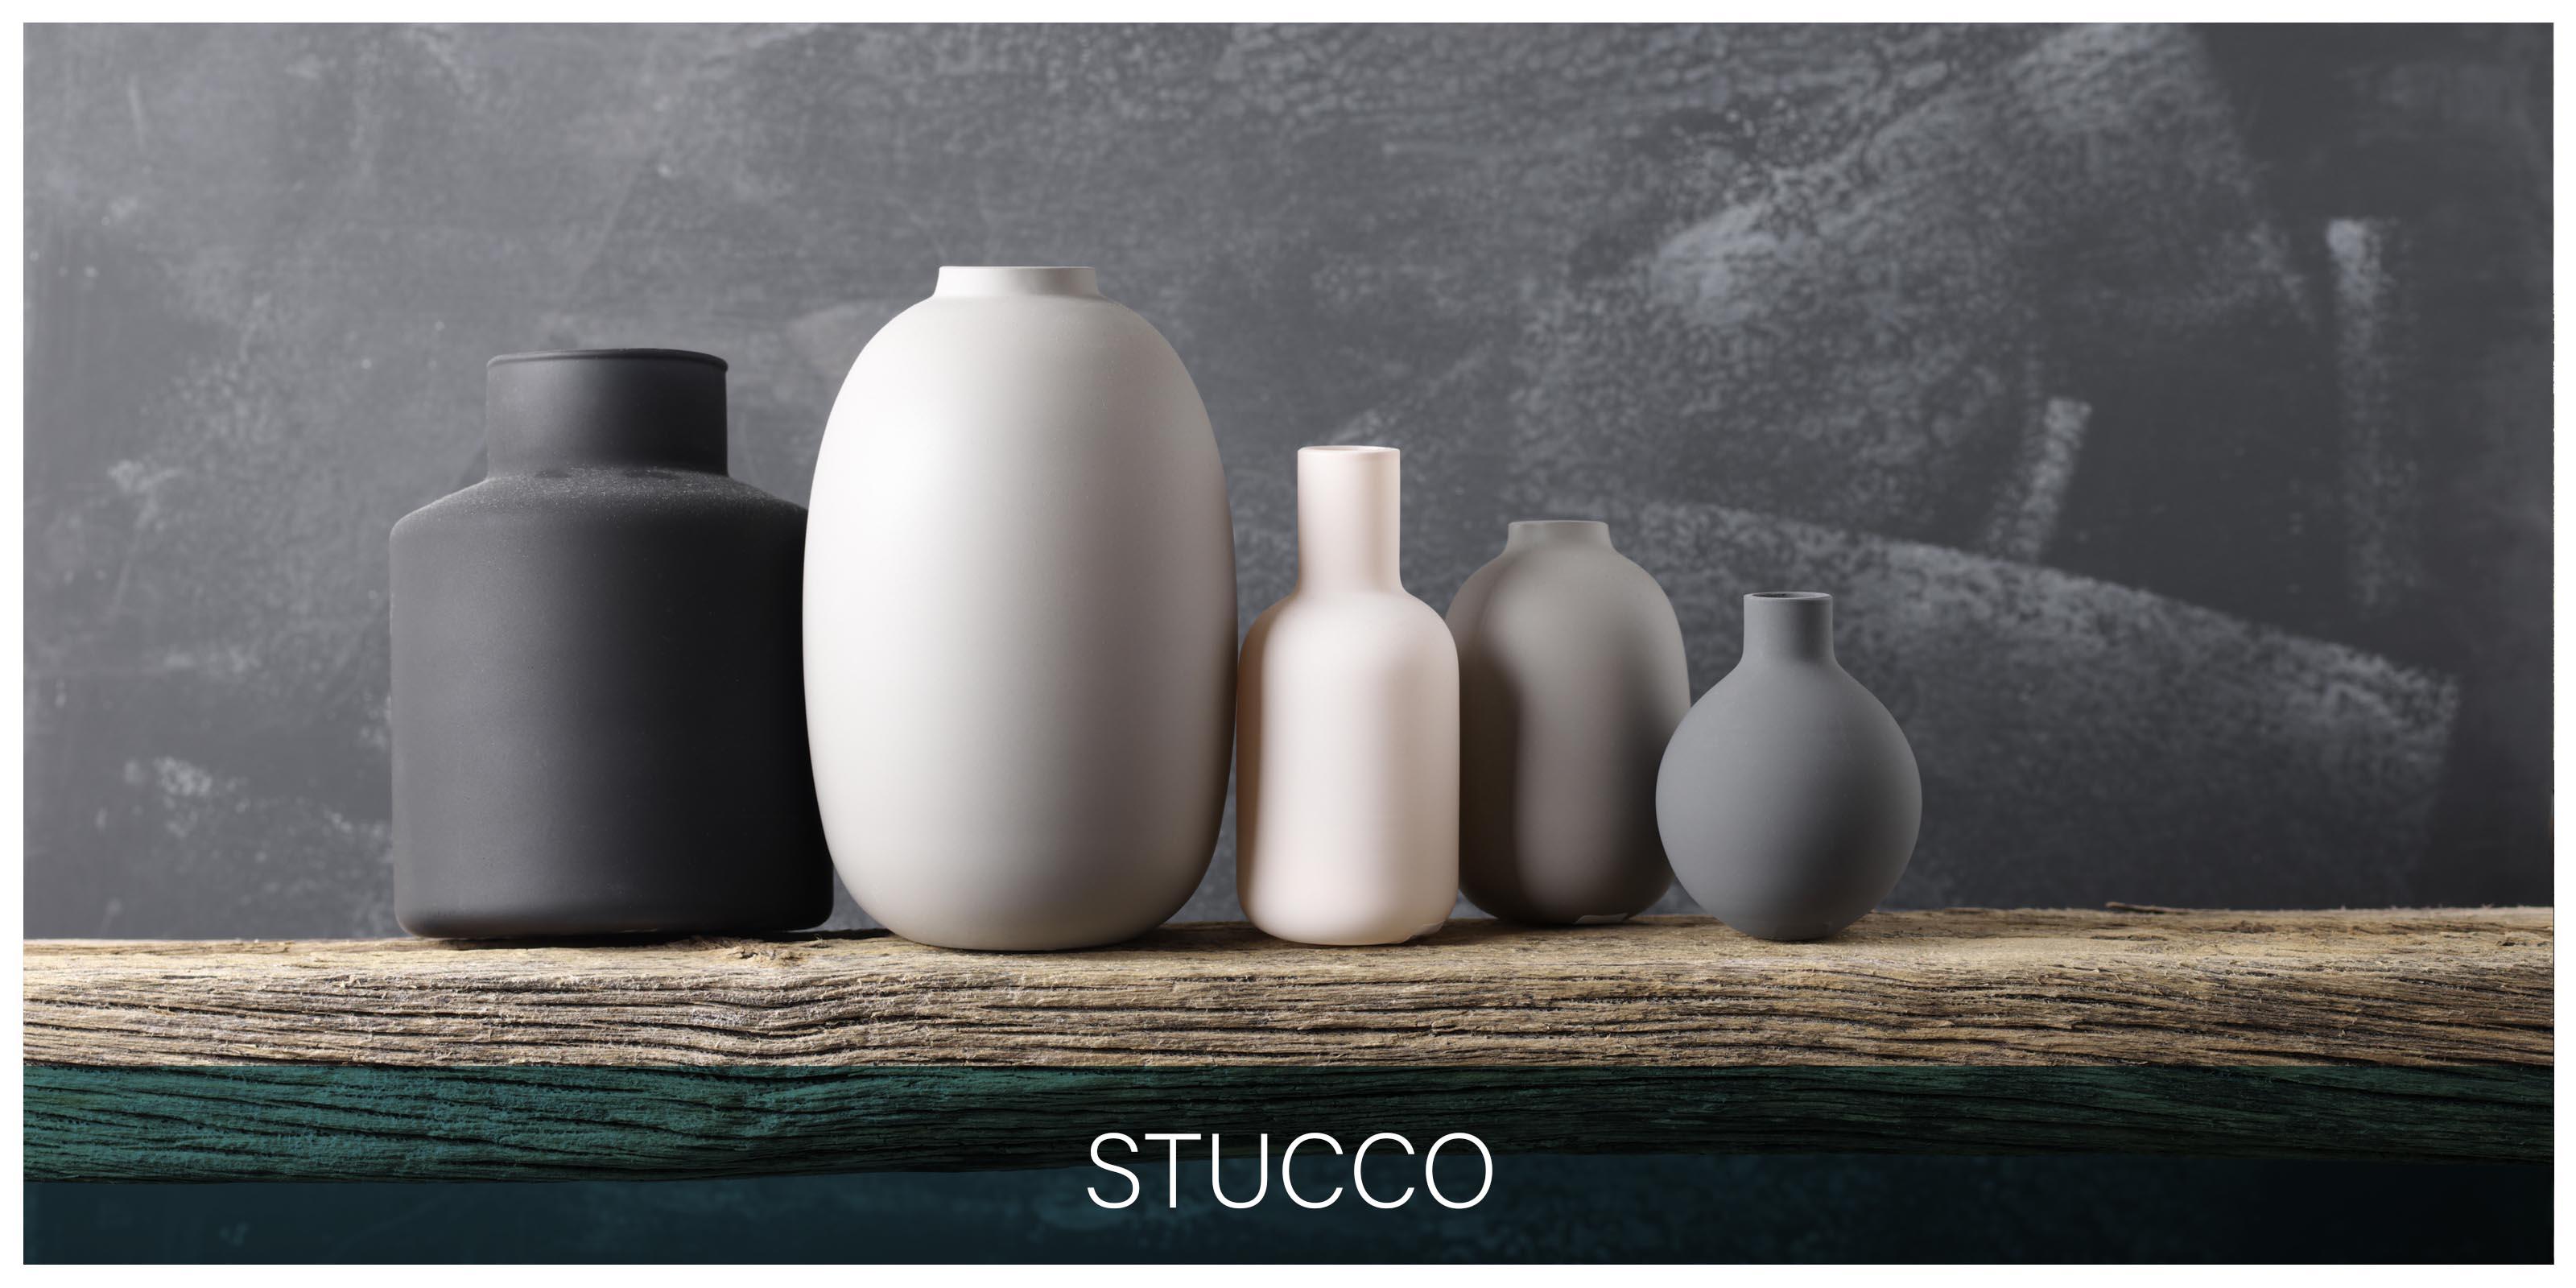 stucco-2kolom-tekst